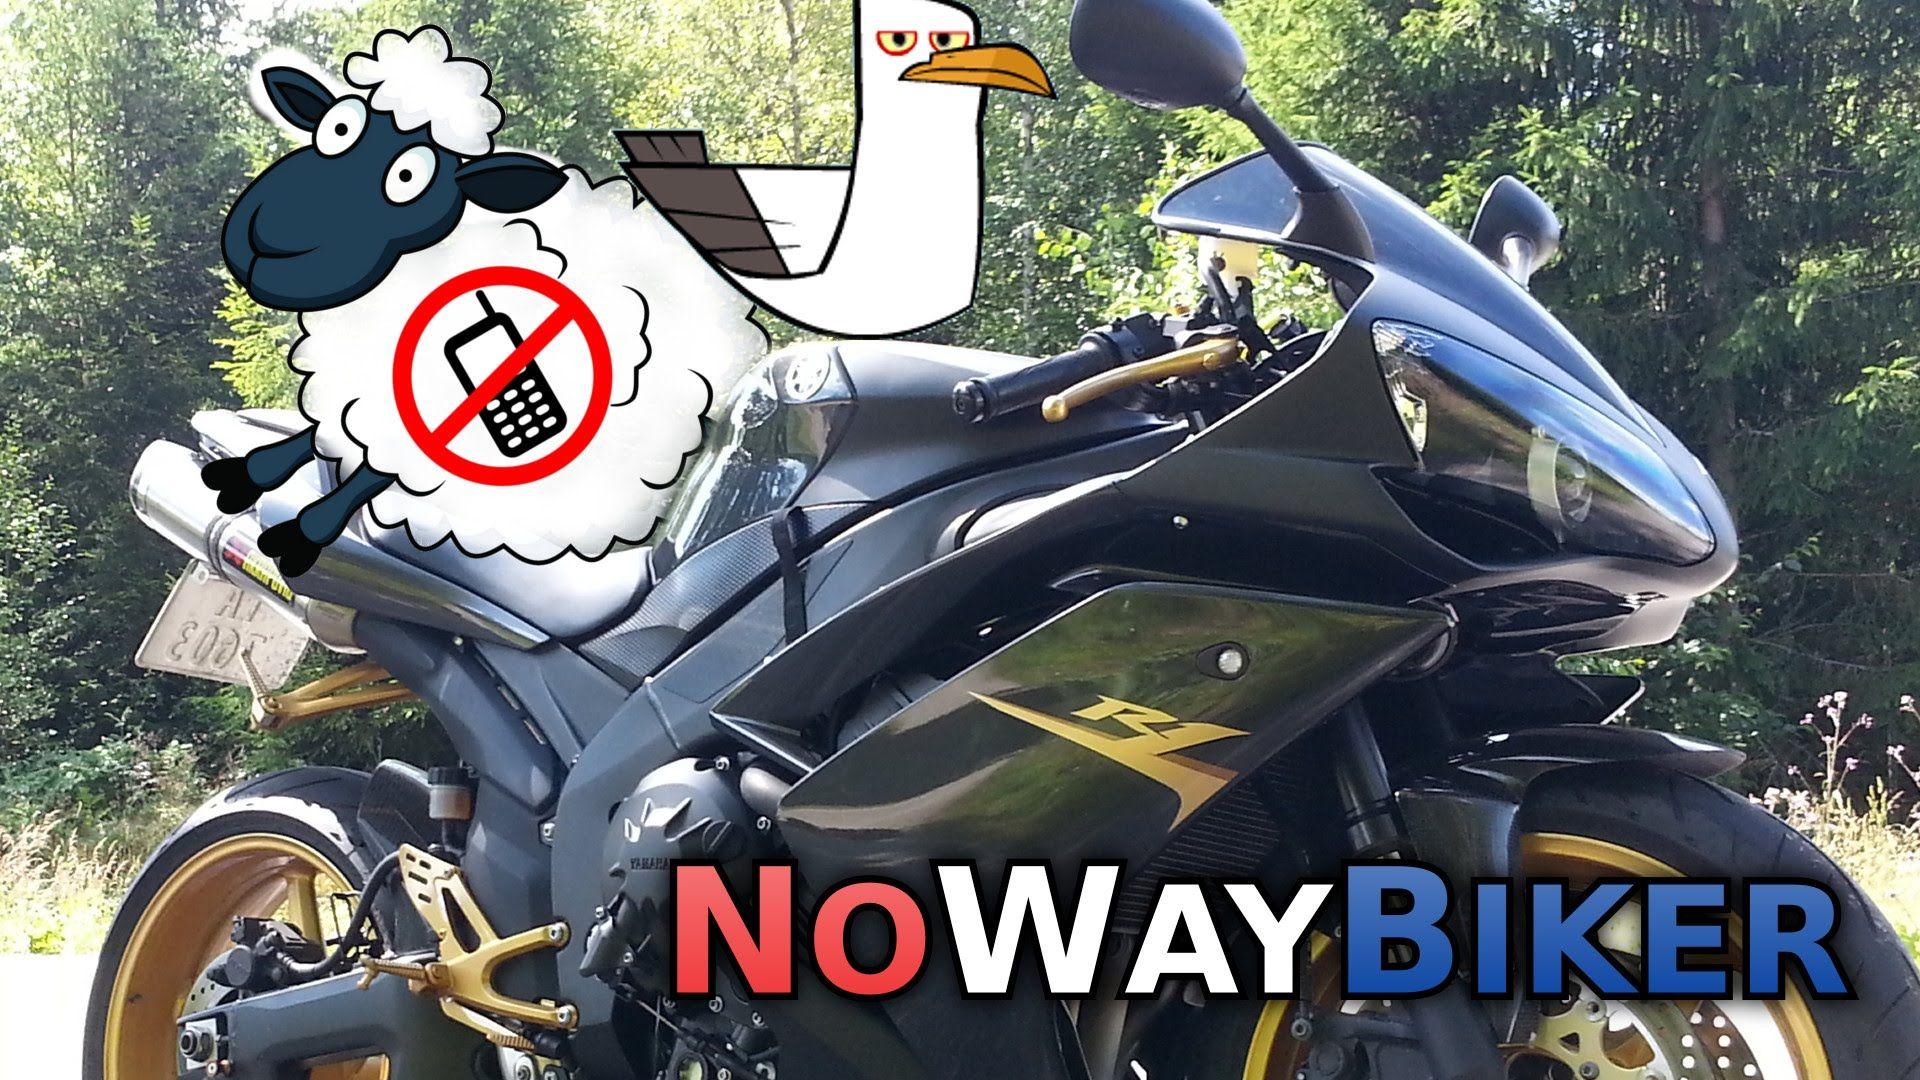 Yamaha Fz1 naked bike streetfighter conversion (part1